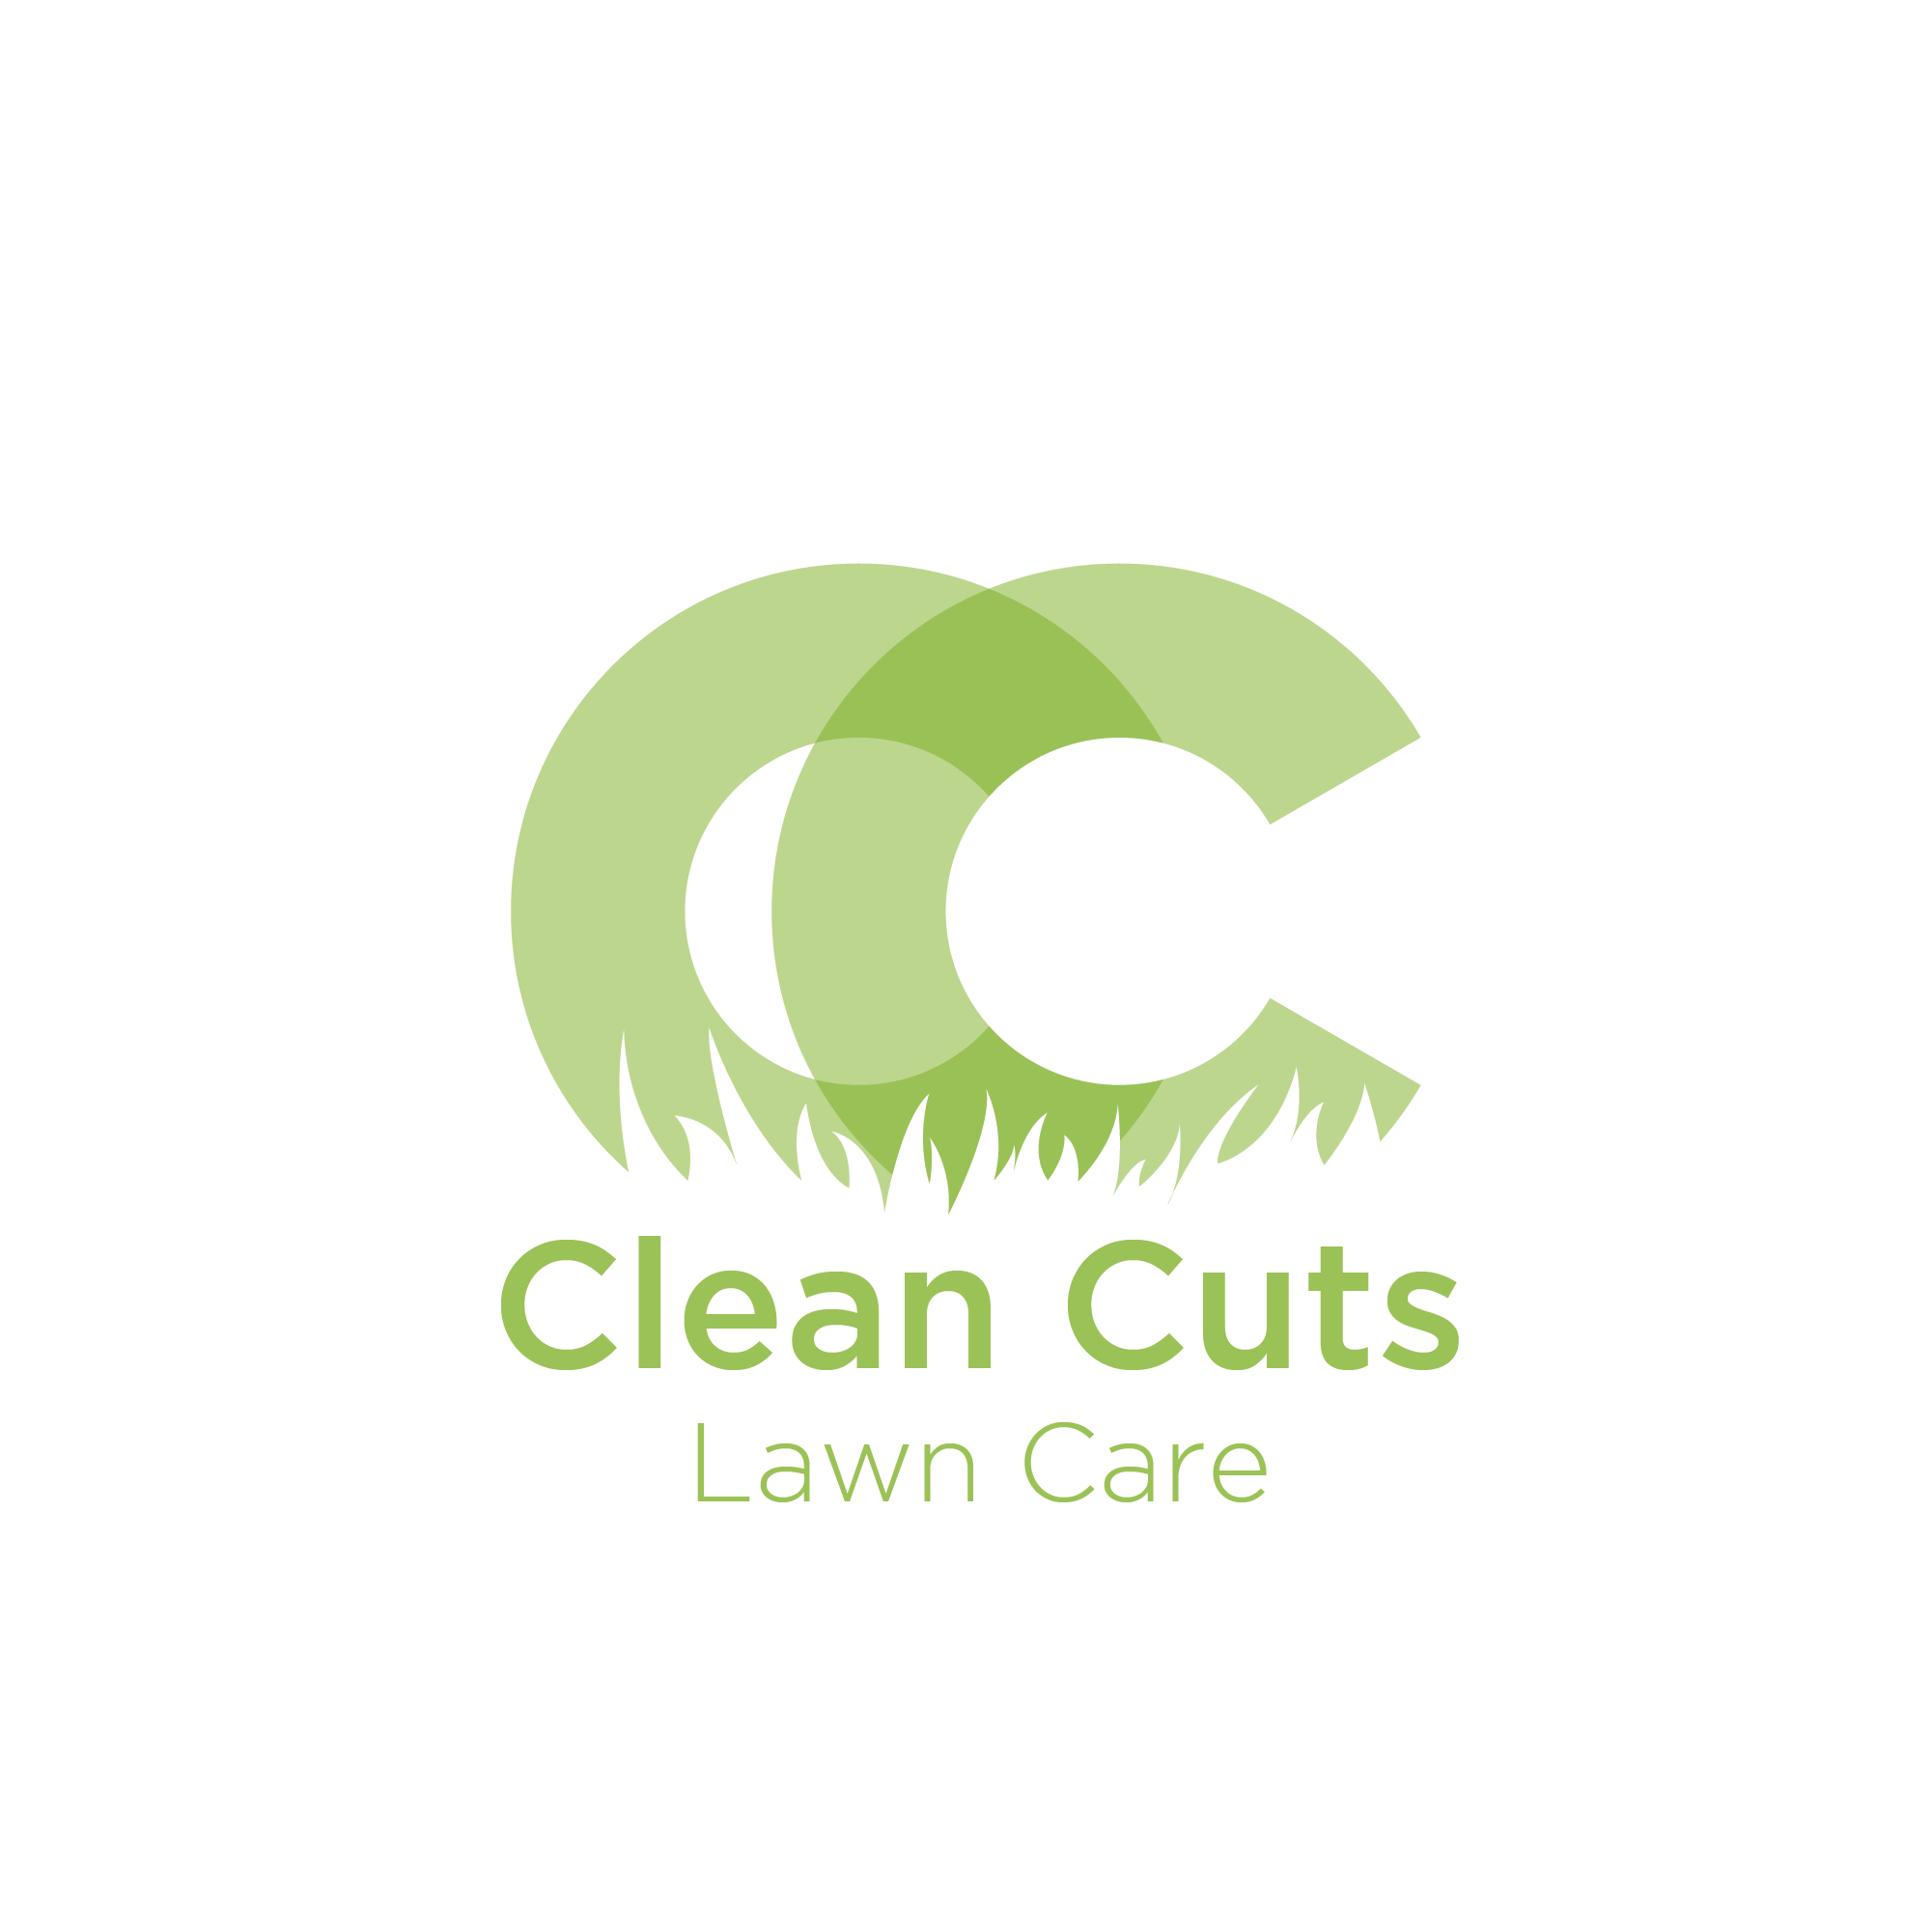 Clean_Cuts_Lawn_Care_Logo_color_daniel-bonner.com.png